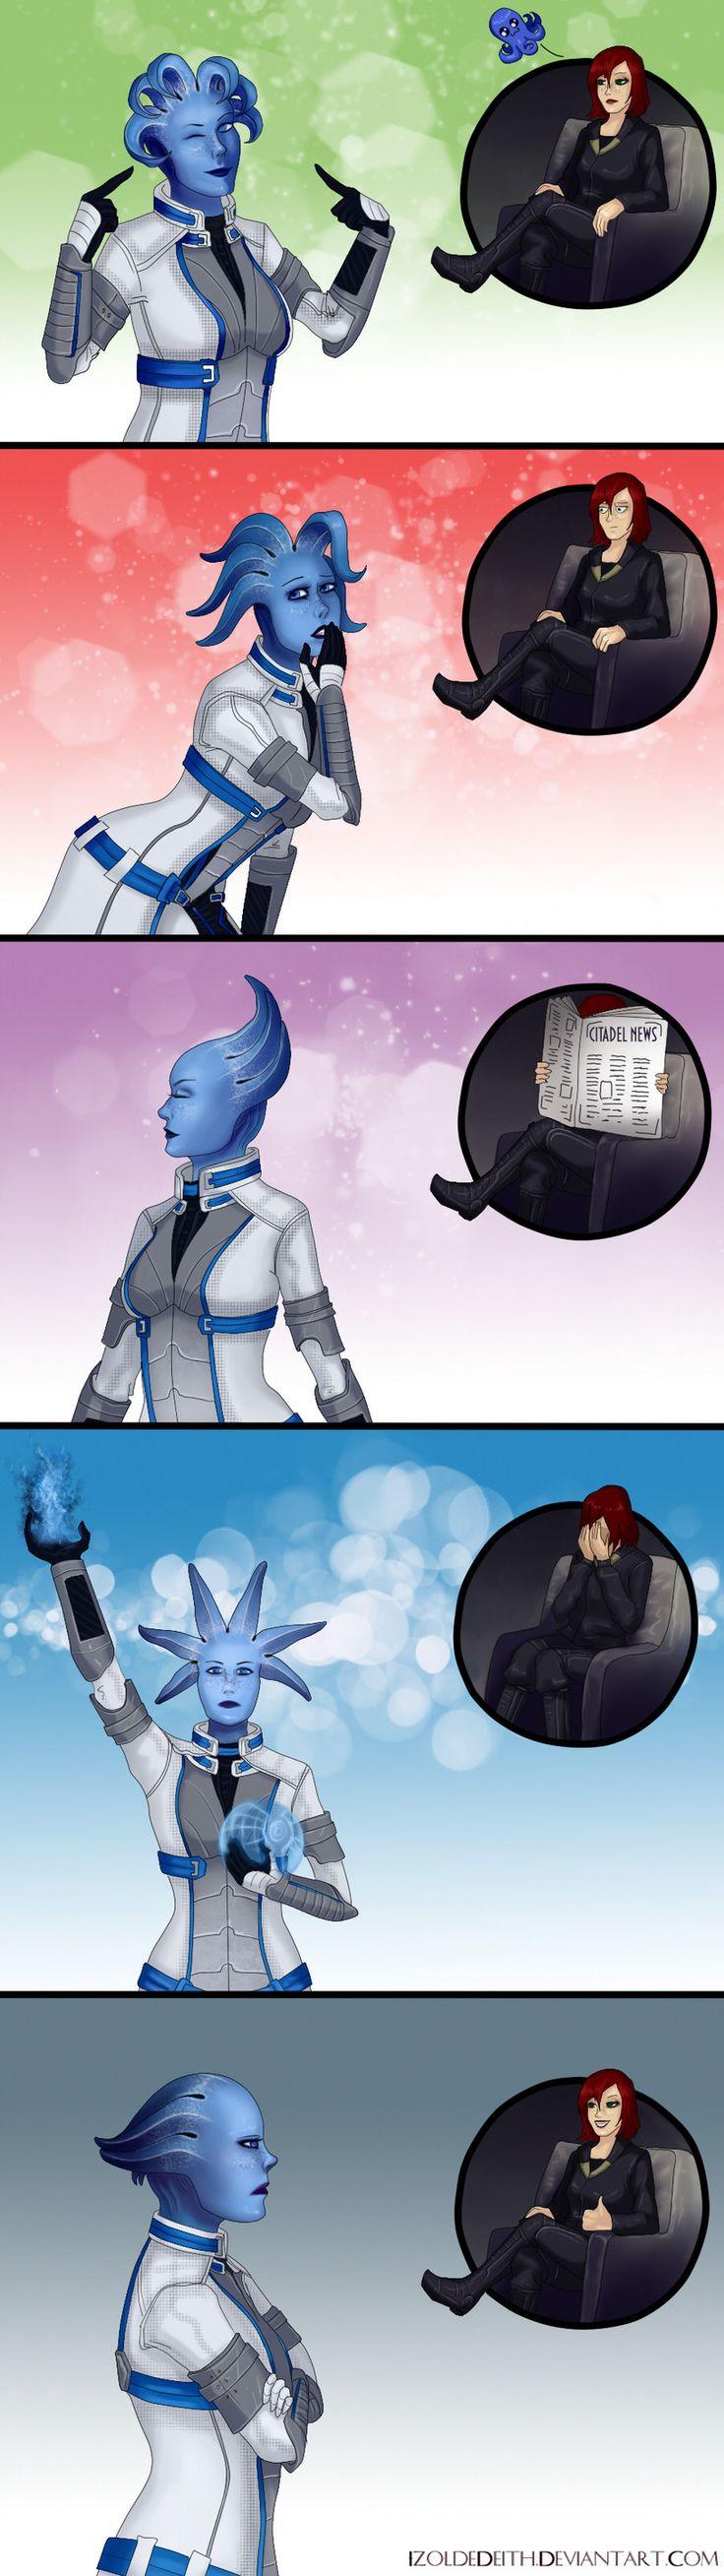 Mass Effect,фэндомы,ME комиксы,Femshep,Liara,IzoldeDeith